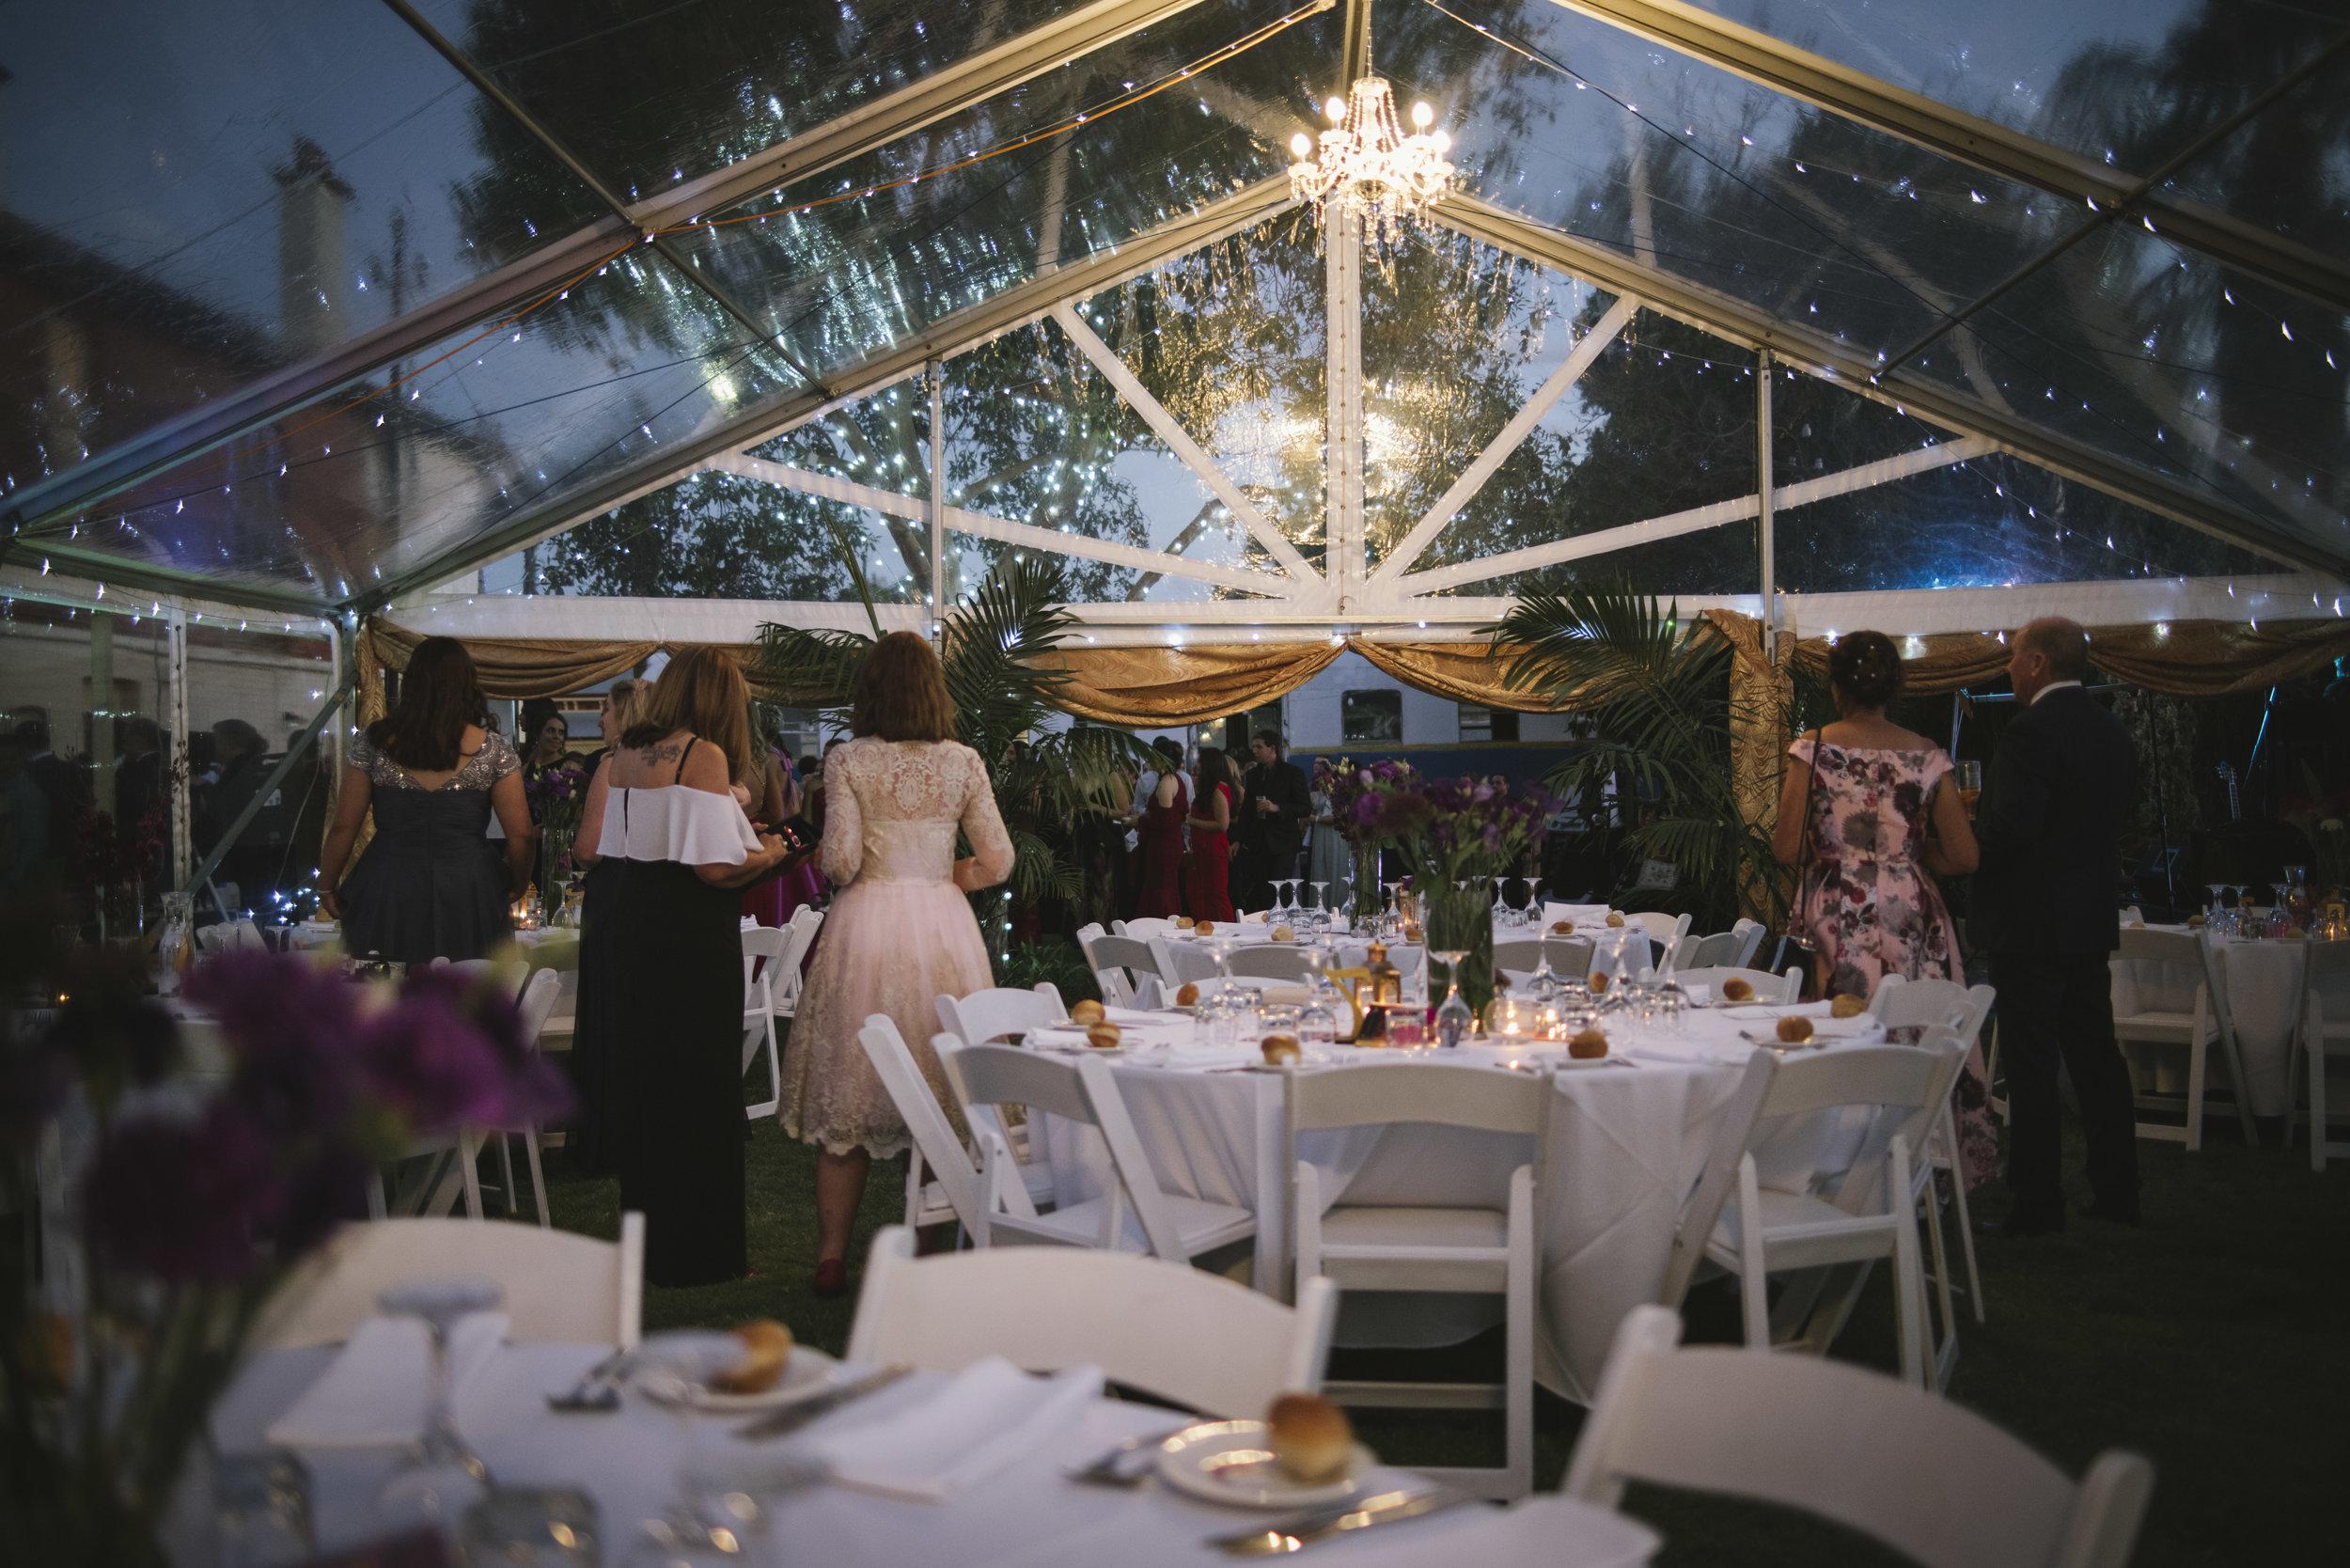 Angie Roe Photography Grand Ball Northam Perth Avon Valley Wheatbelt Event Photographer (35).jpg